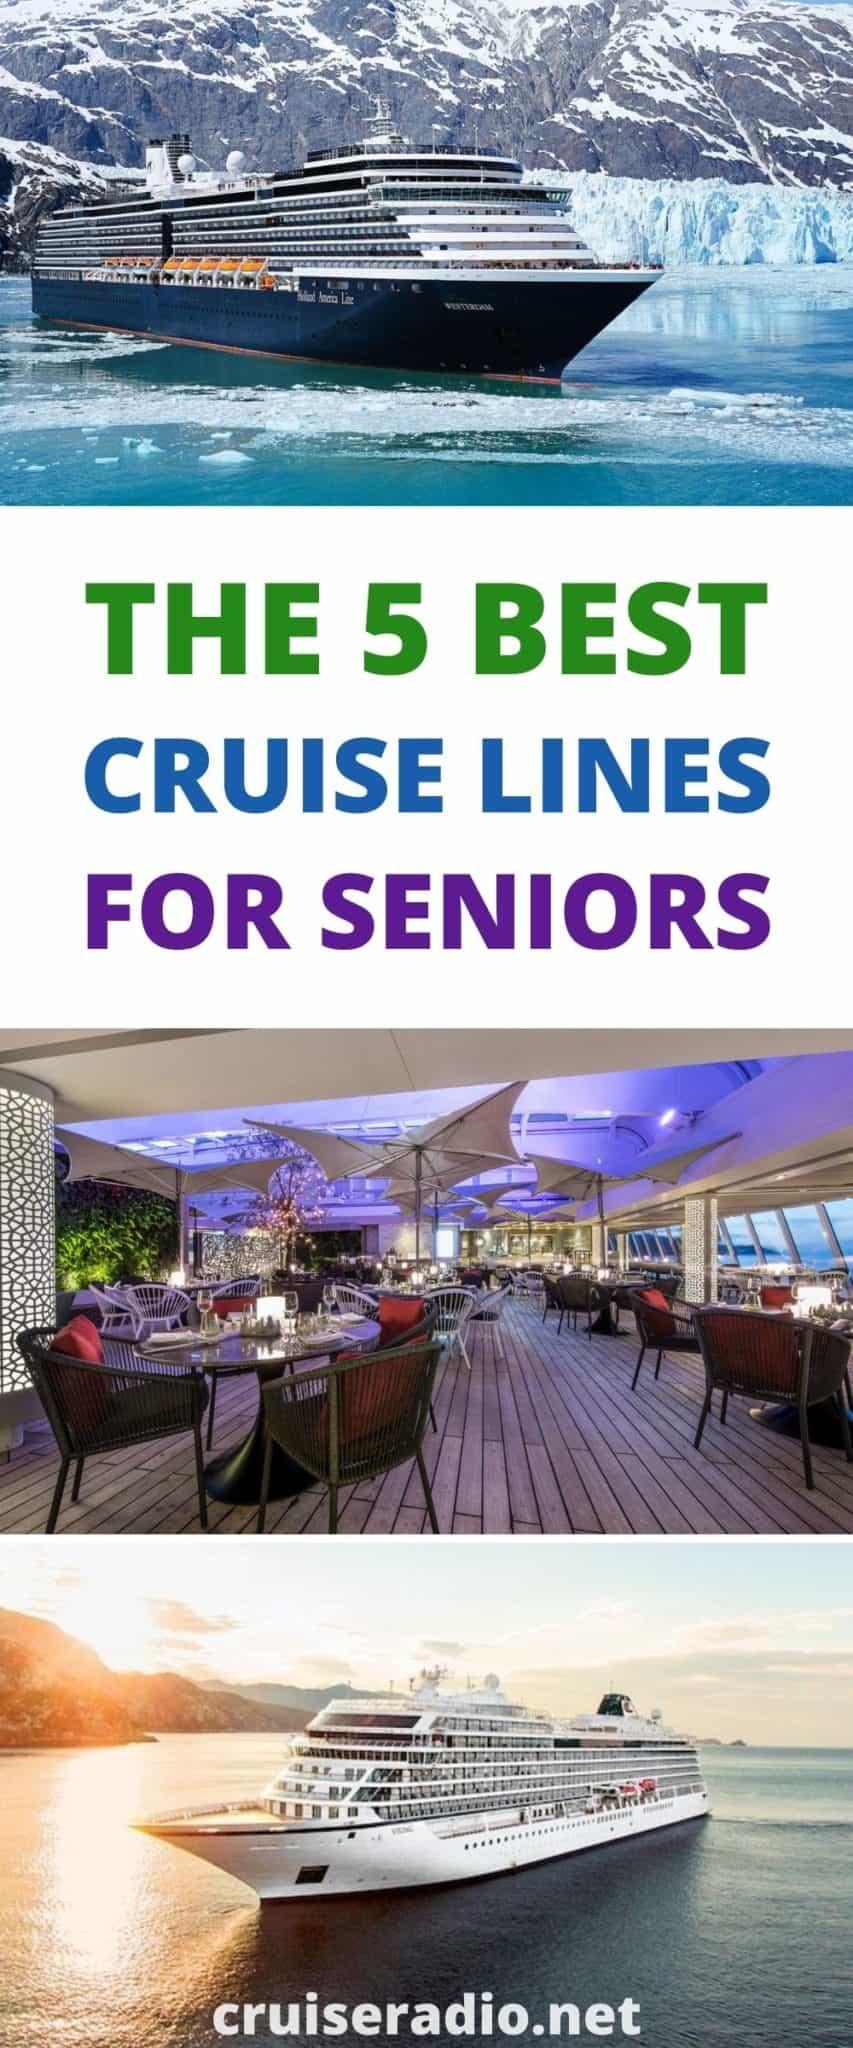 5 best cruise lines for seniors